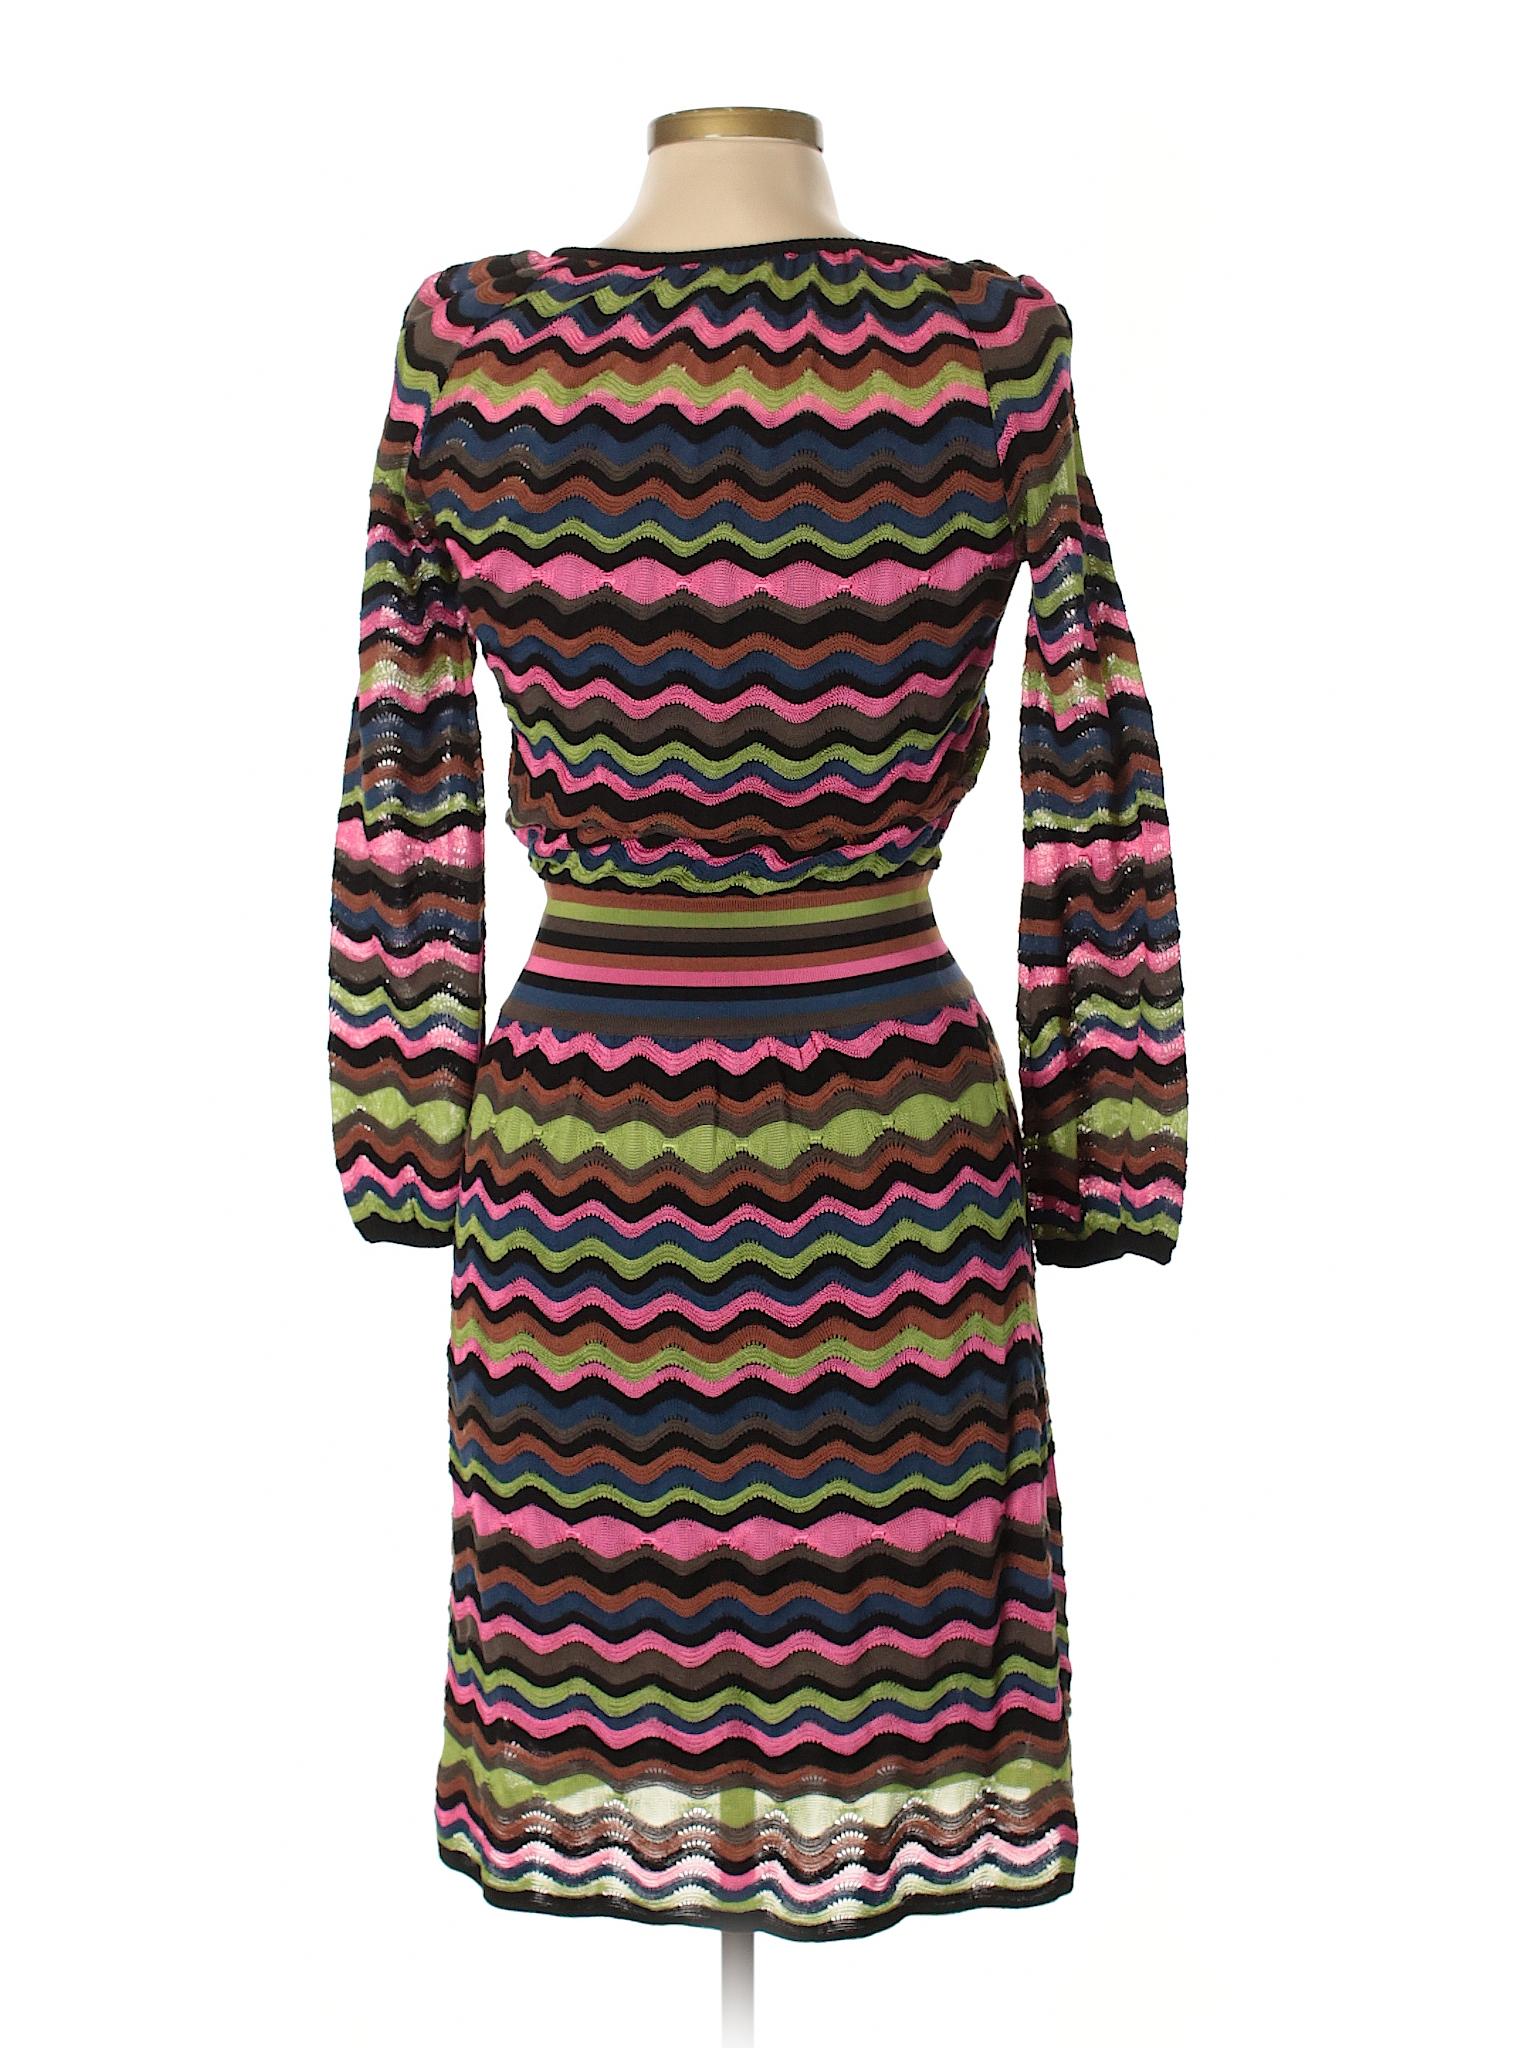 Missoni Casual M Boutique winter Dress ECq71